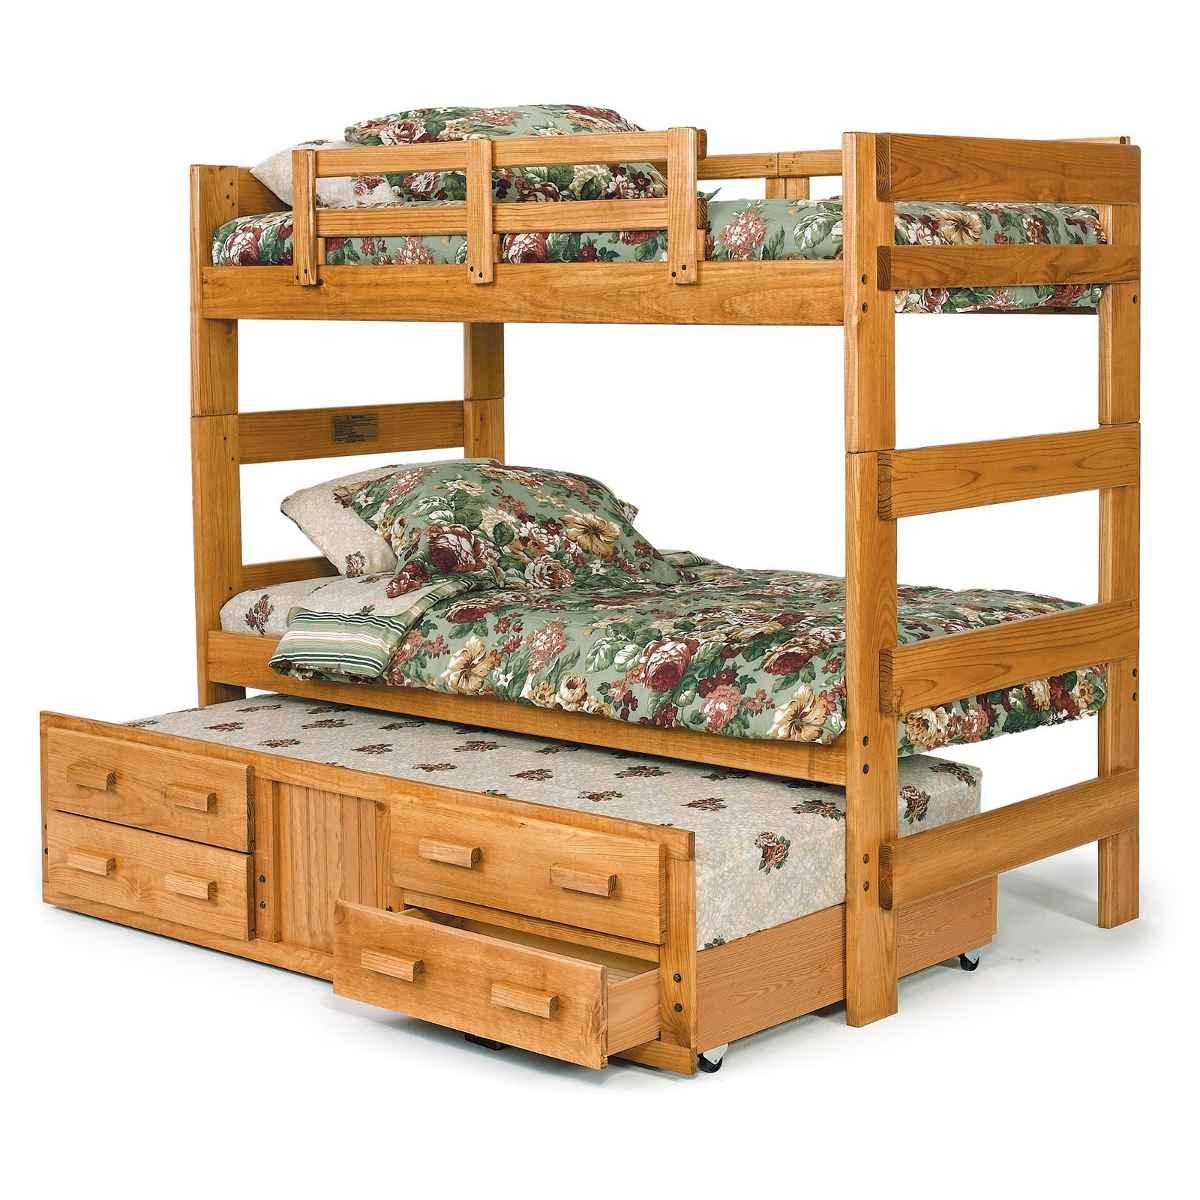 woodcrest heartland teenage bedrooms tubular bunks